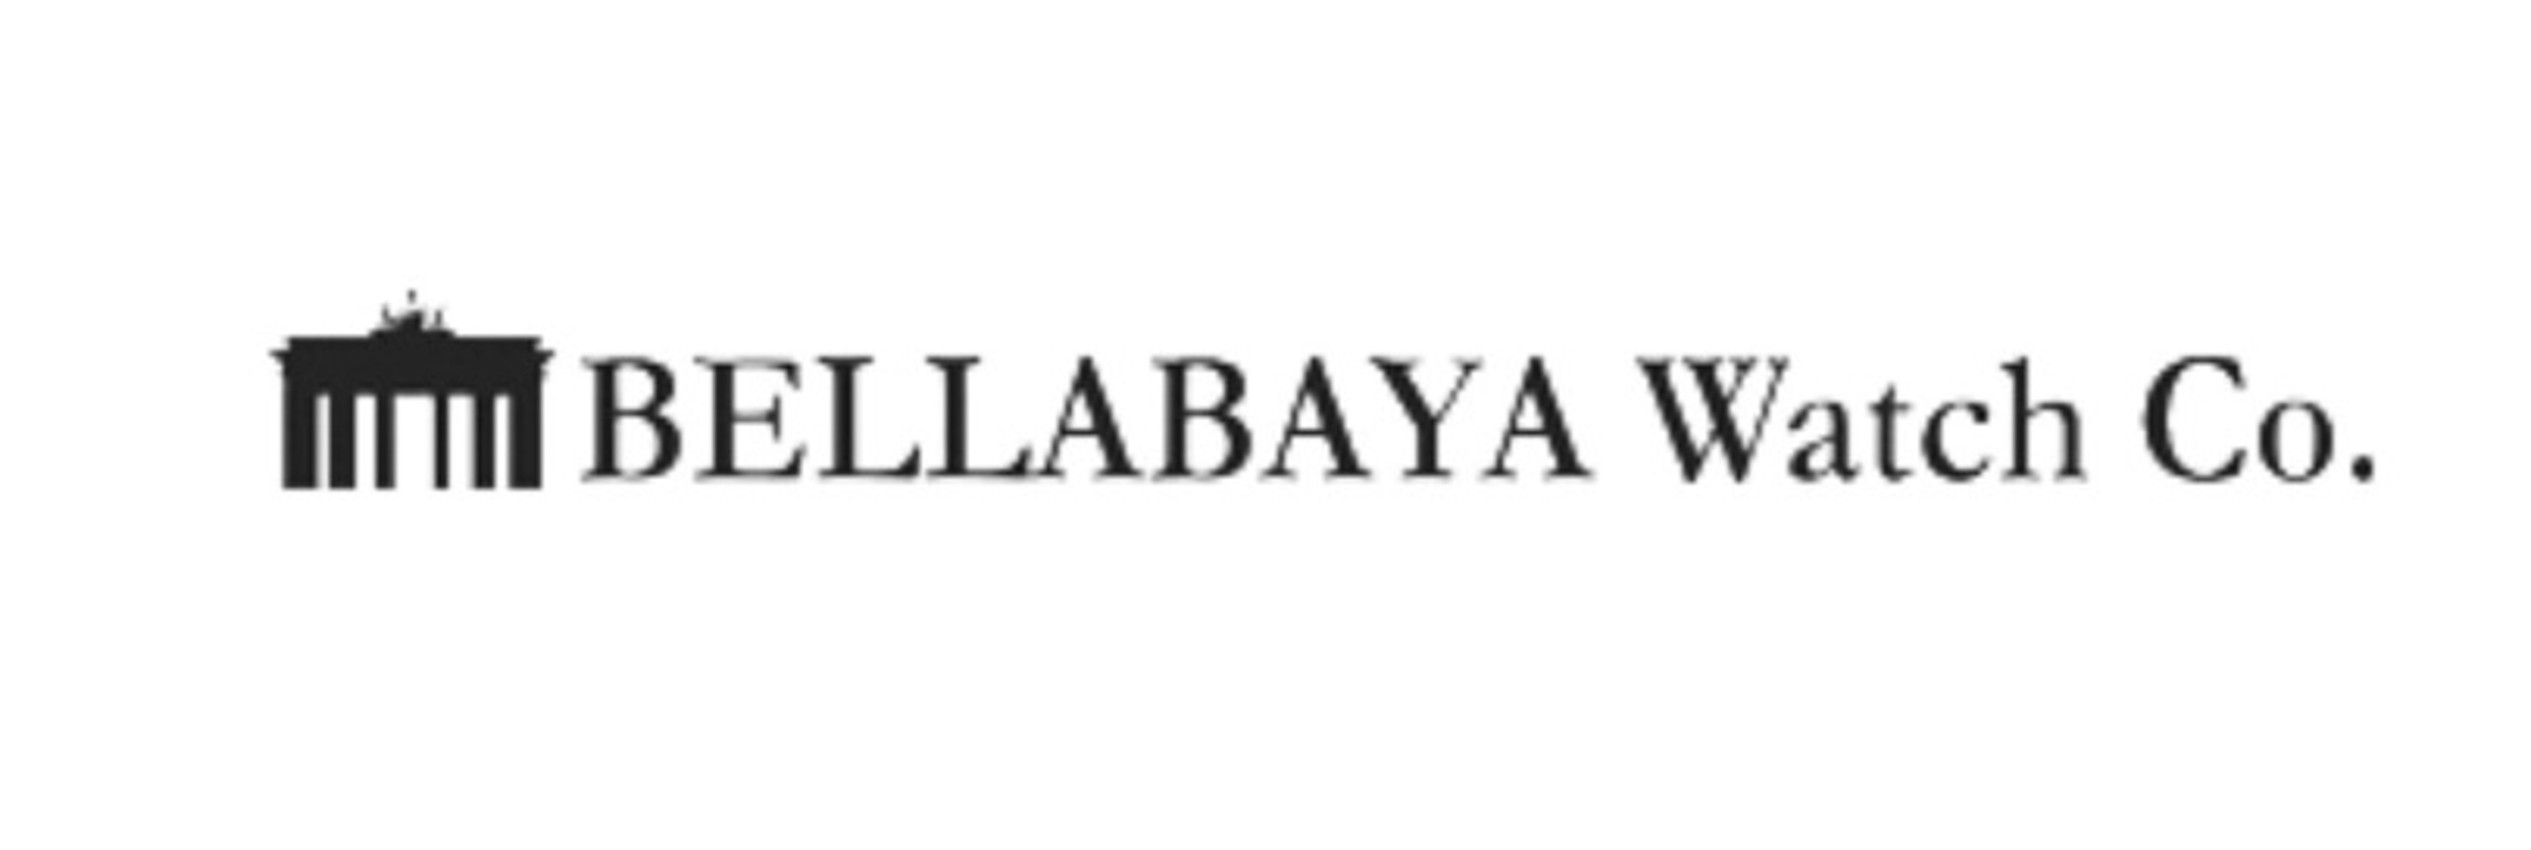 Watches Company Logos